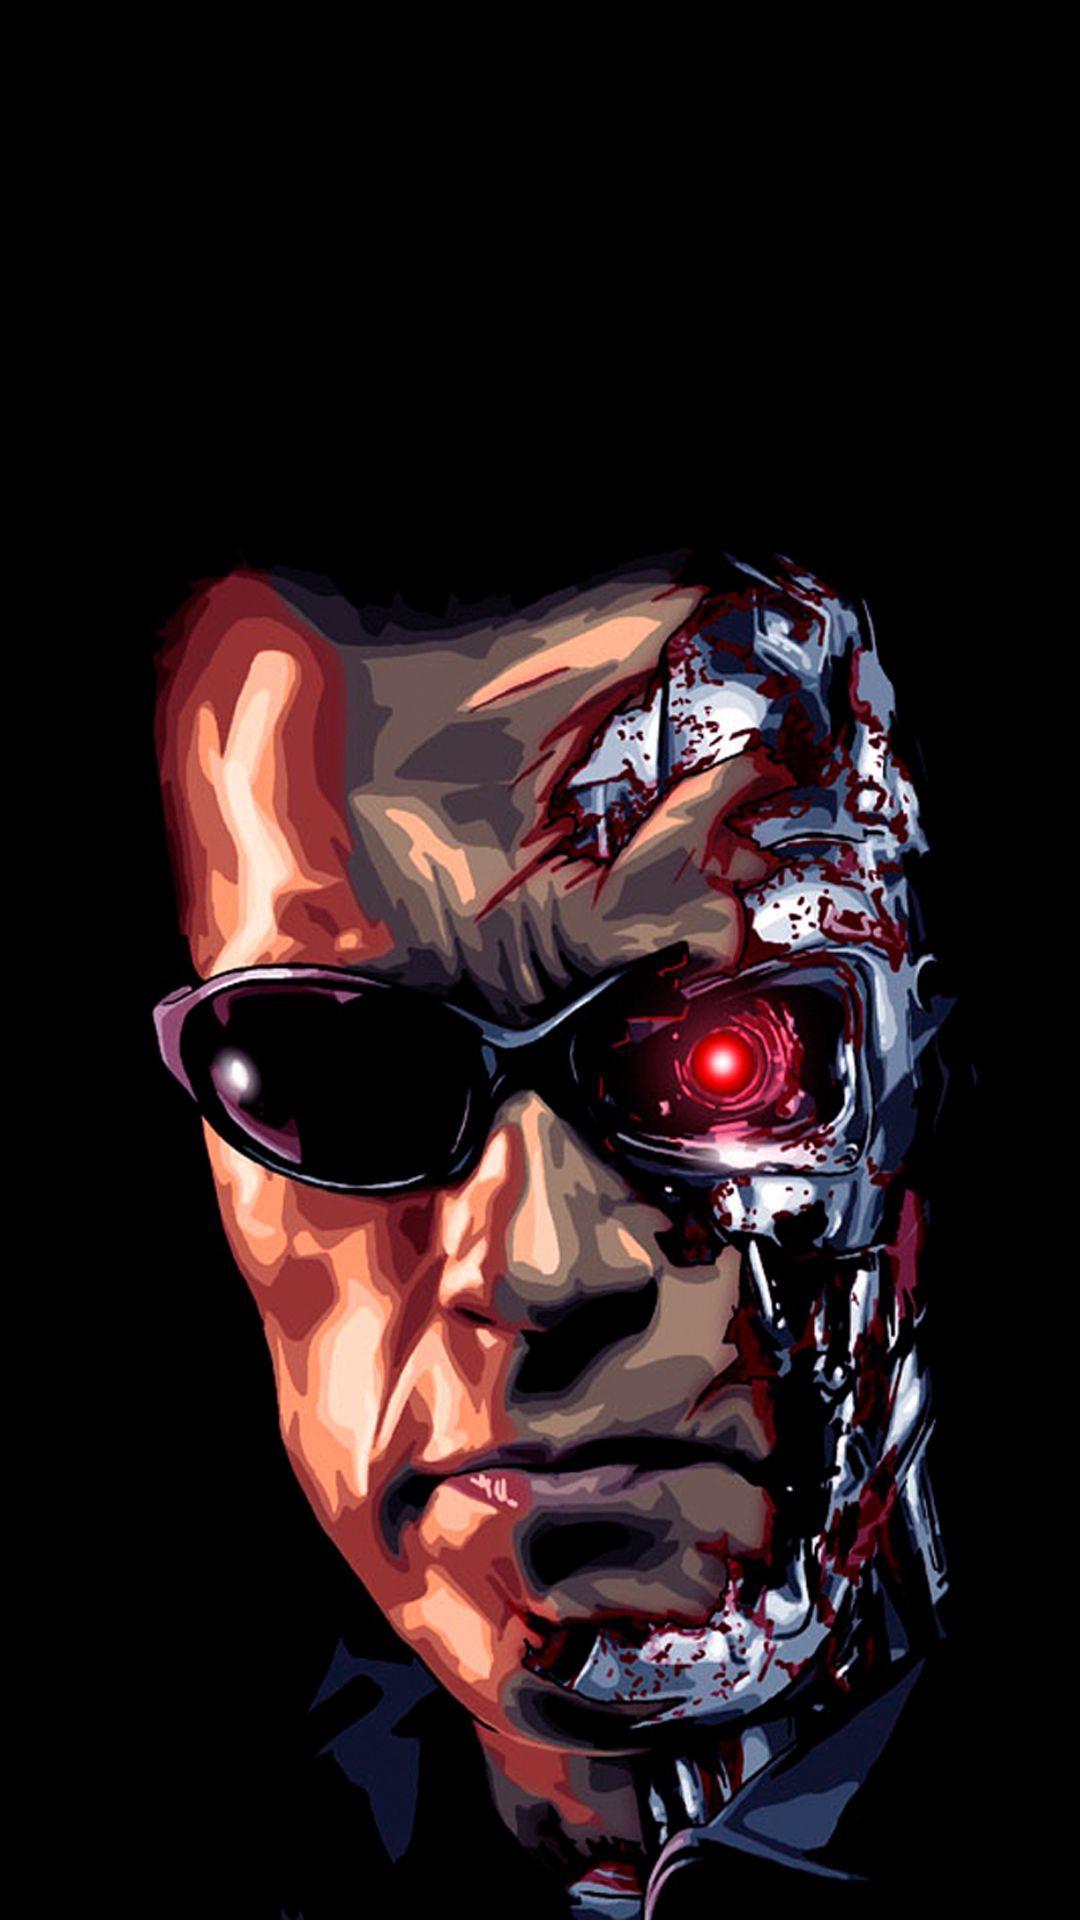 Wallpapers Terminator Httpstcohubprftnvh Terminator , Ends